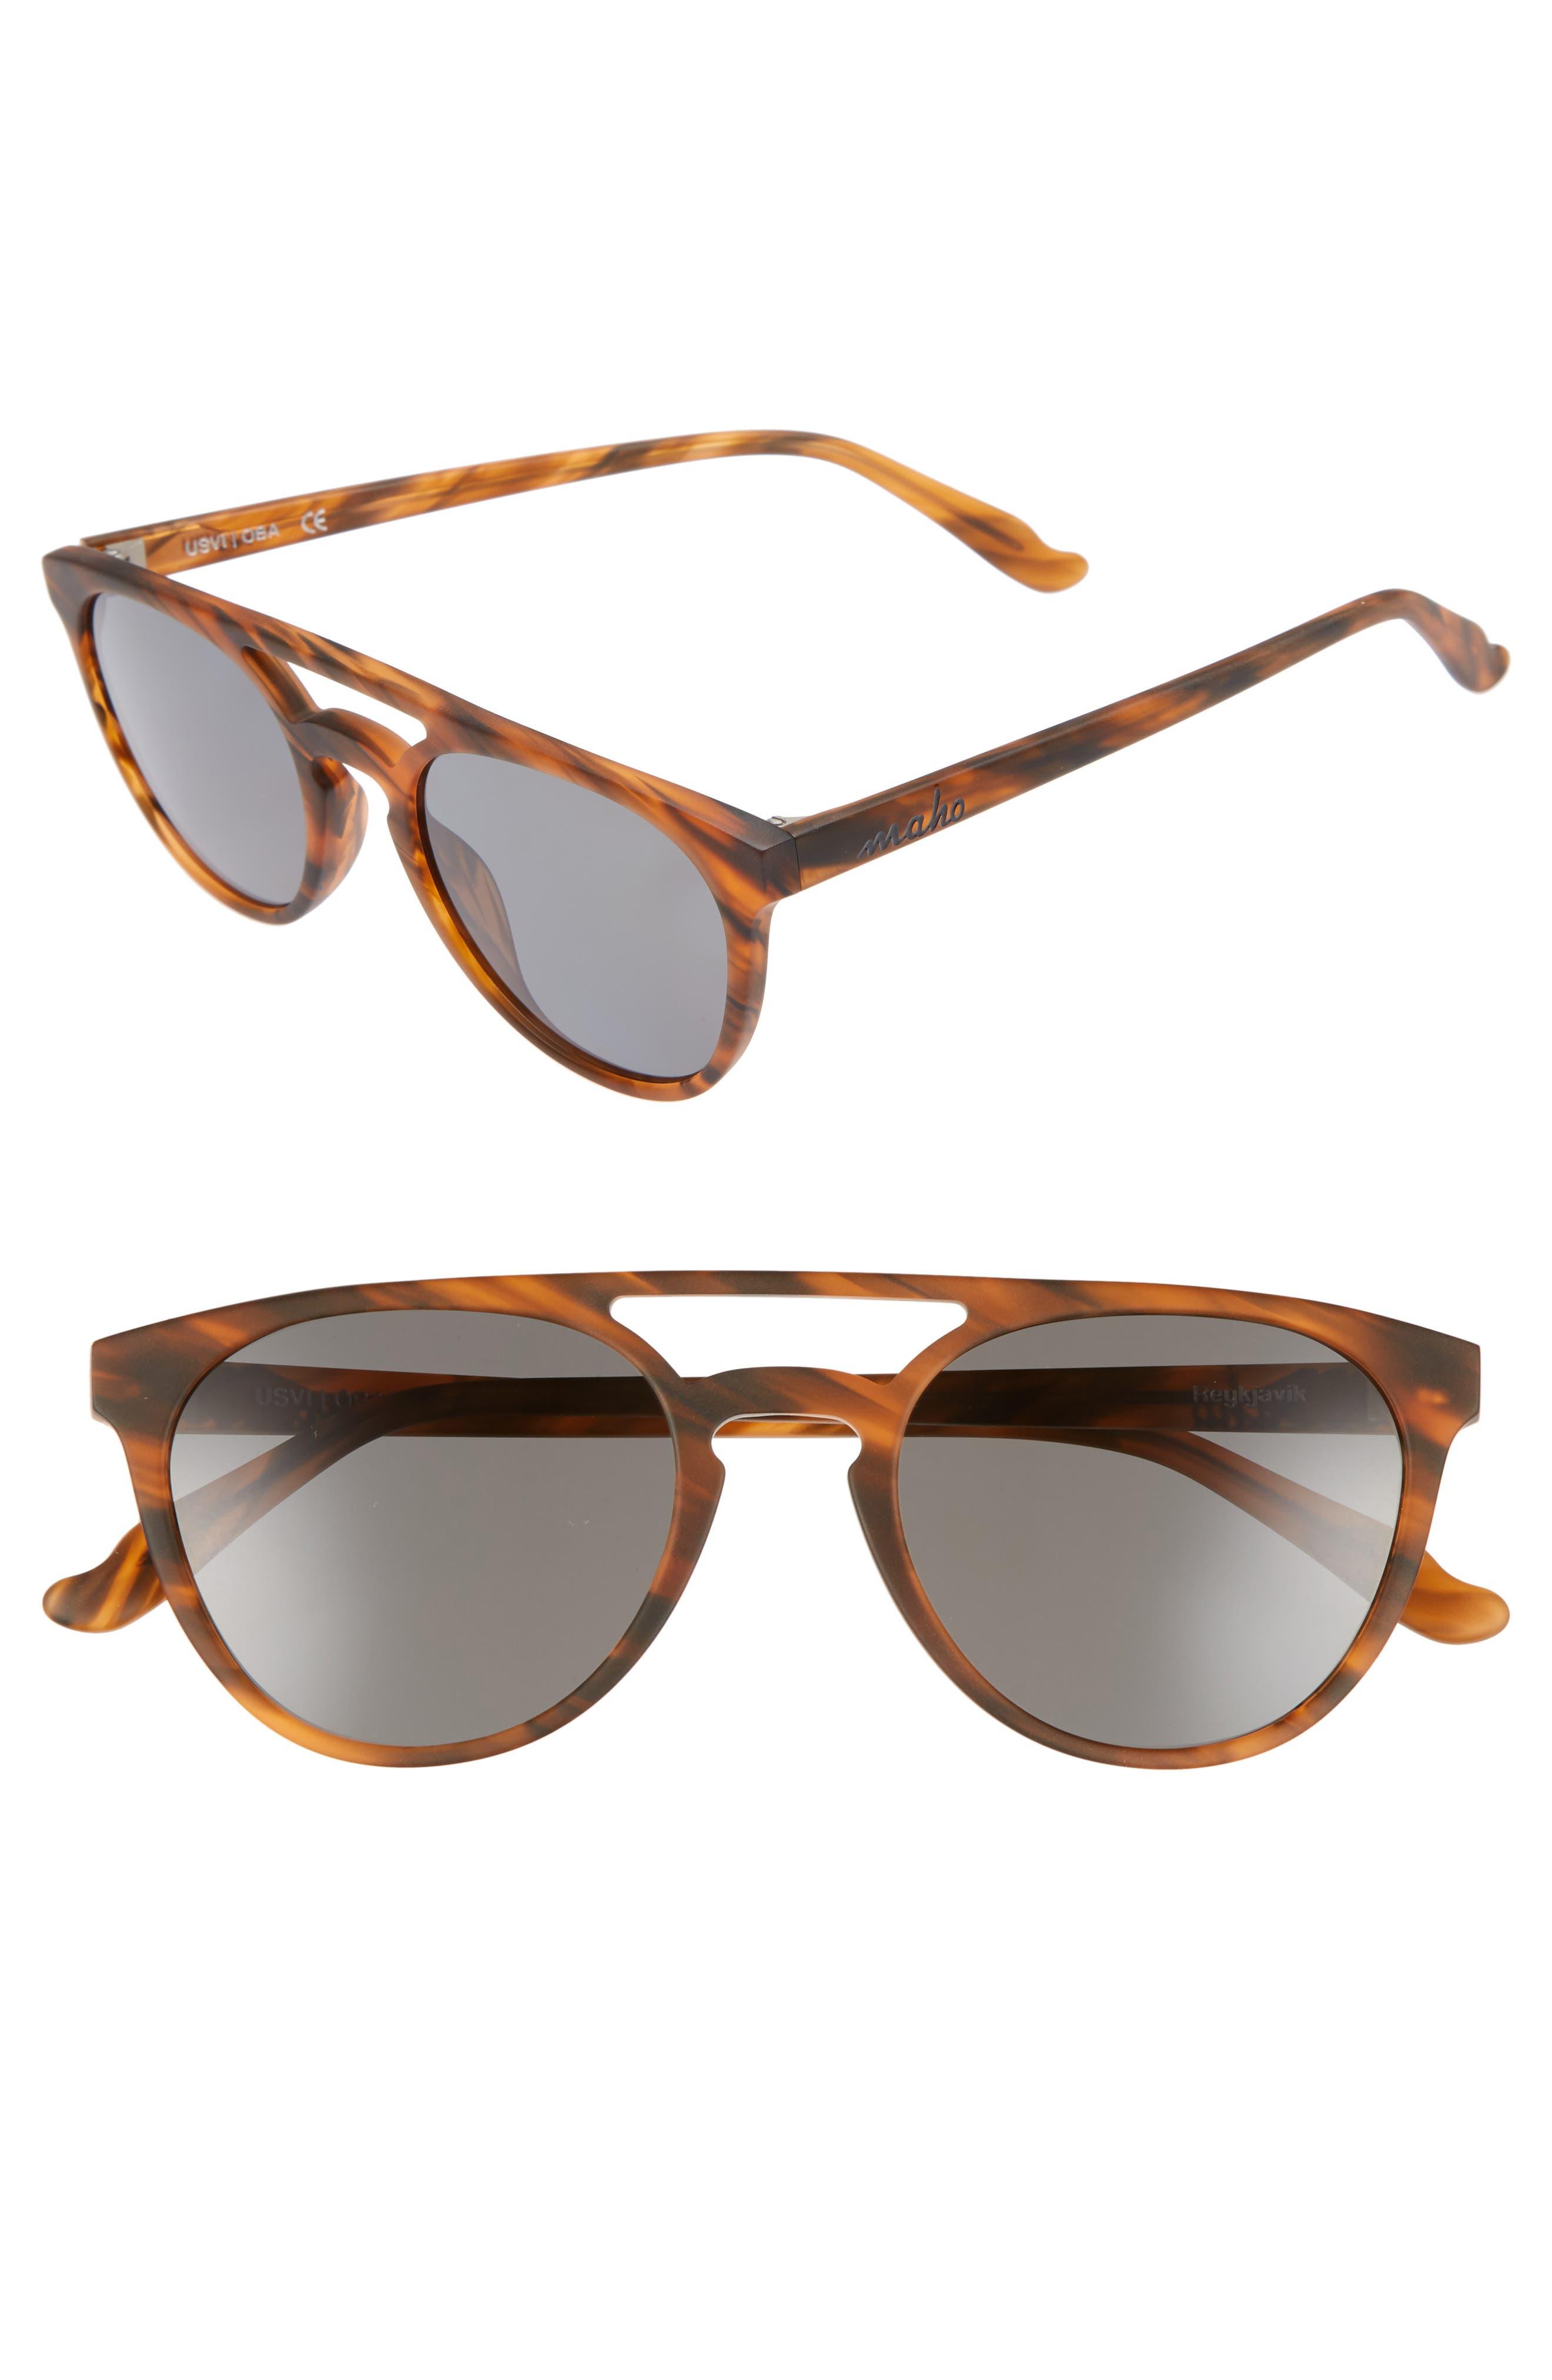 Reykjavík 49mm Polarized Round Sunglasses,                             Main thumbnail 1, color,                             Whisky